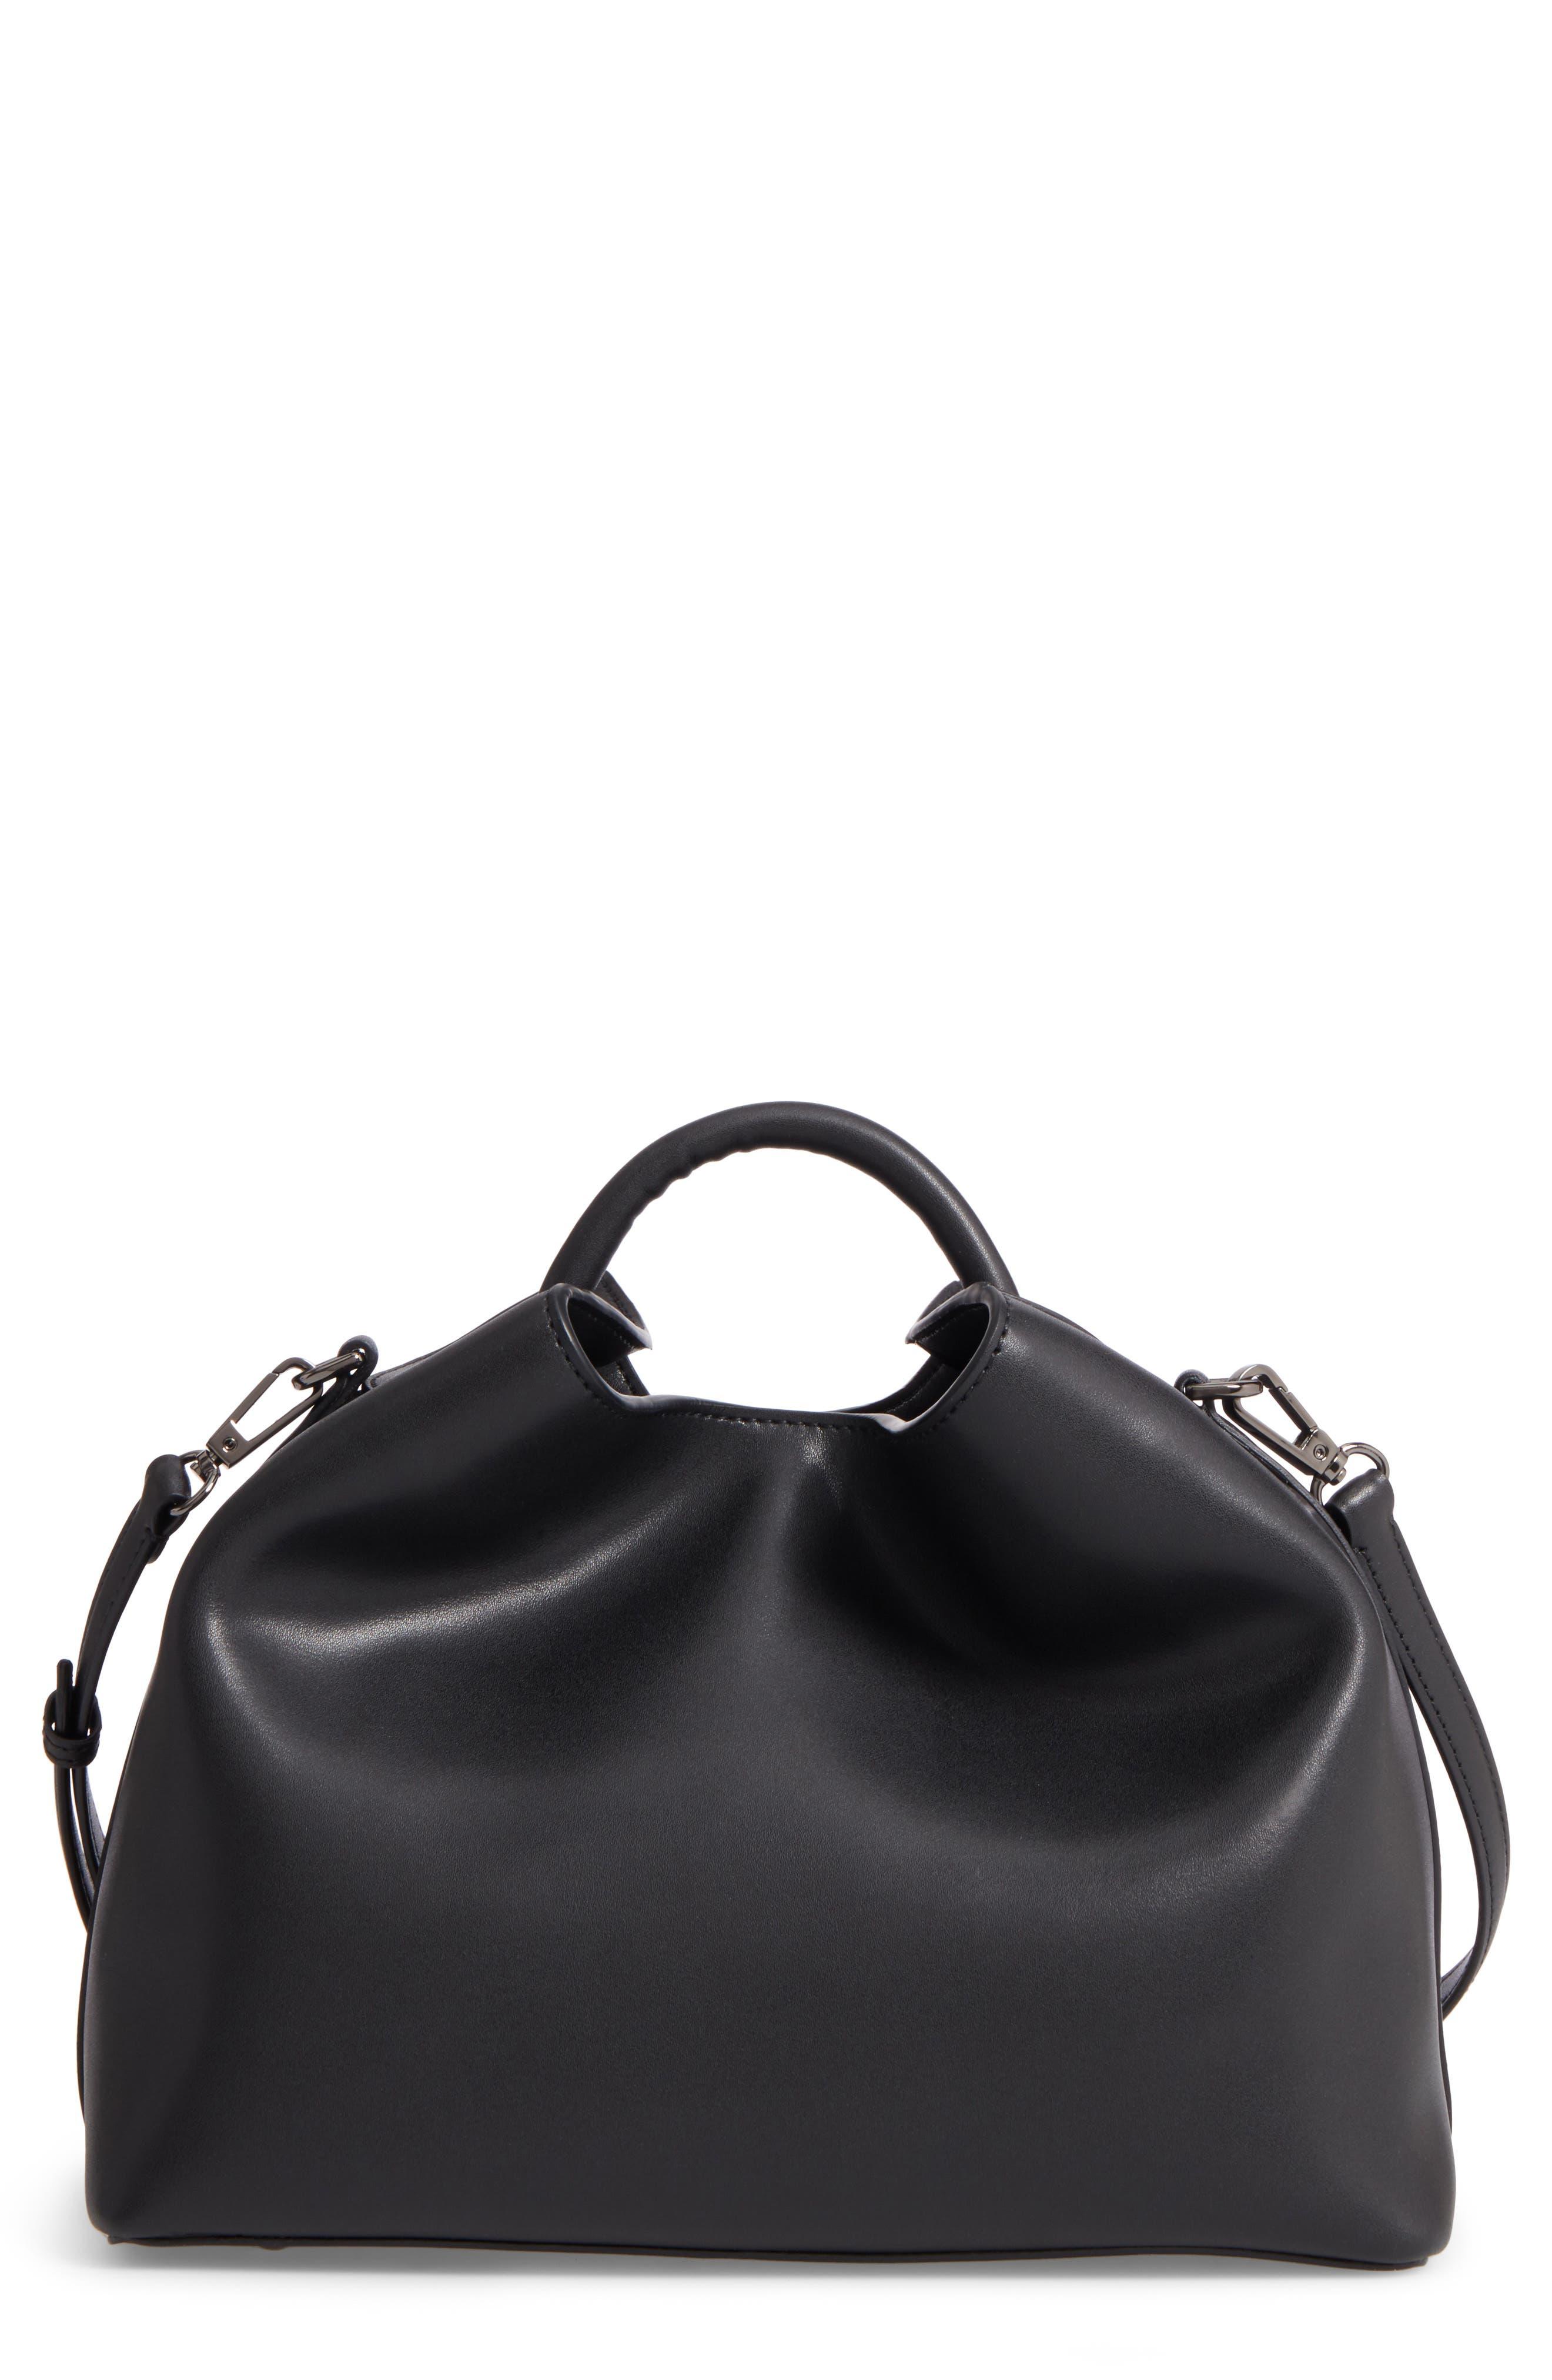 Raisin Leather Handbag,                             Main thumbnail 1, color,